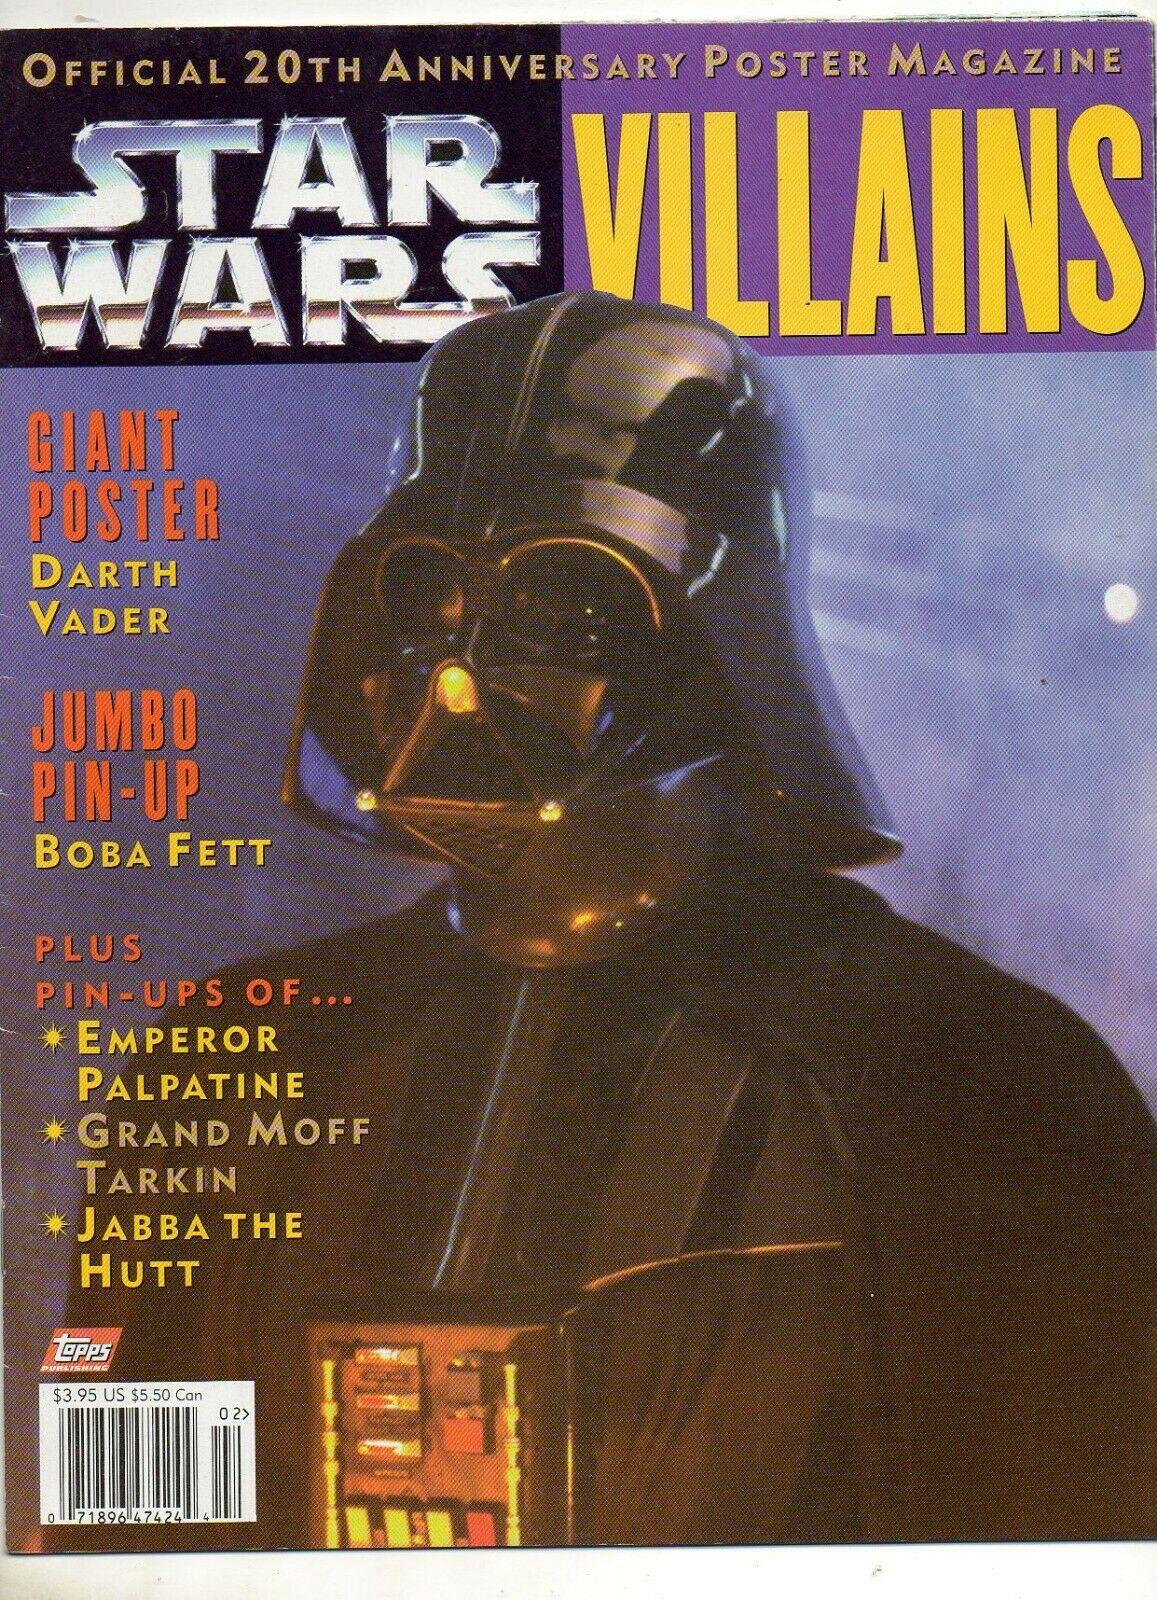 Star Wars Villains (Official Poster Magazine 1997)